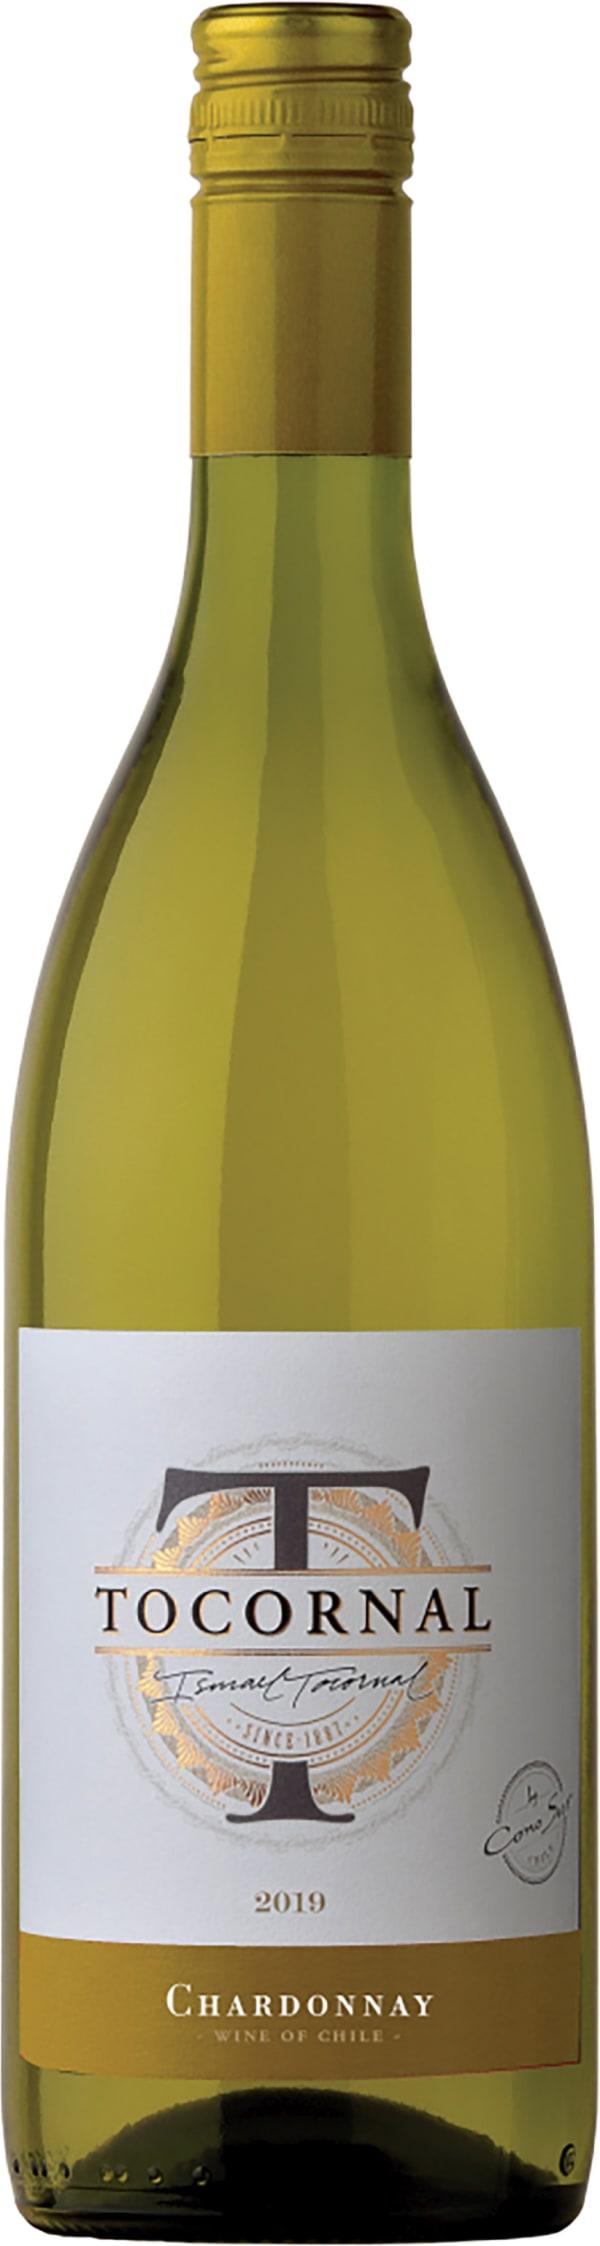 Cono Sur Tocornal Chardonnay 2017